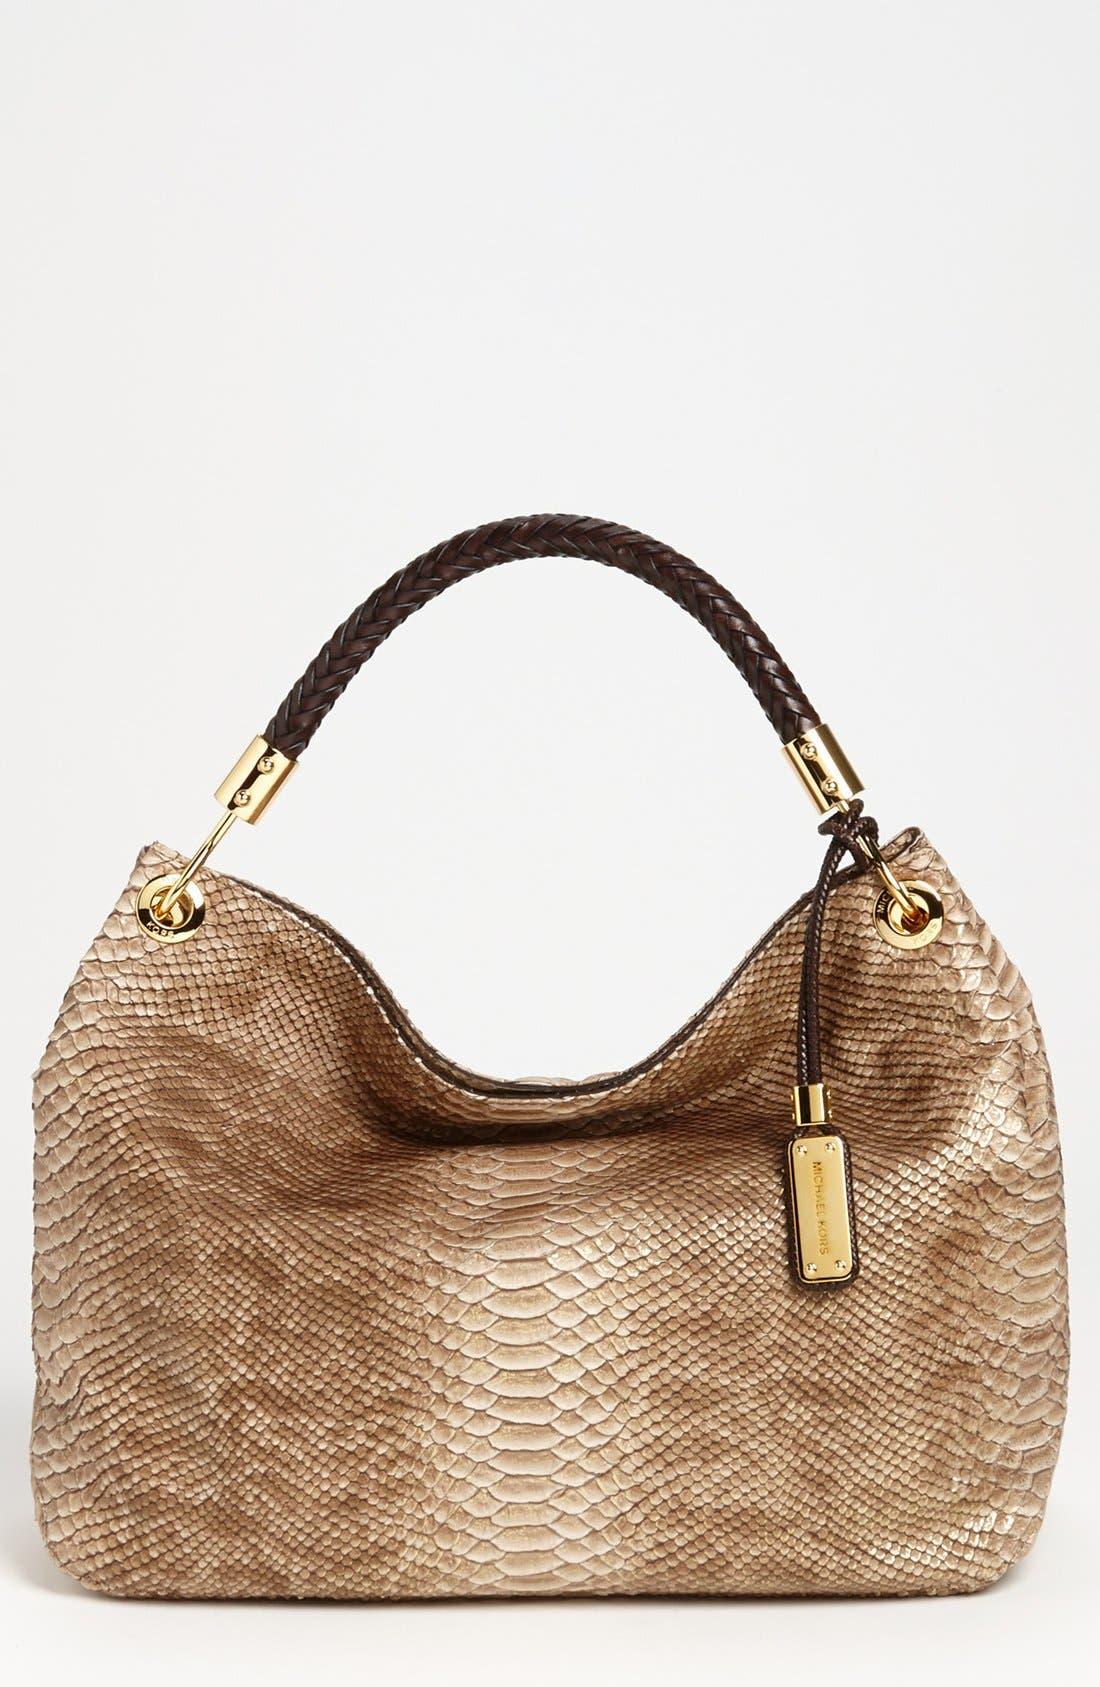 Alternate Image 1 Selected - Michael Kors 'Skorpios' Python Print Shoulder Bag